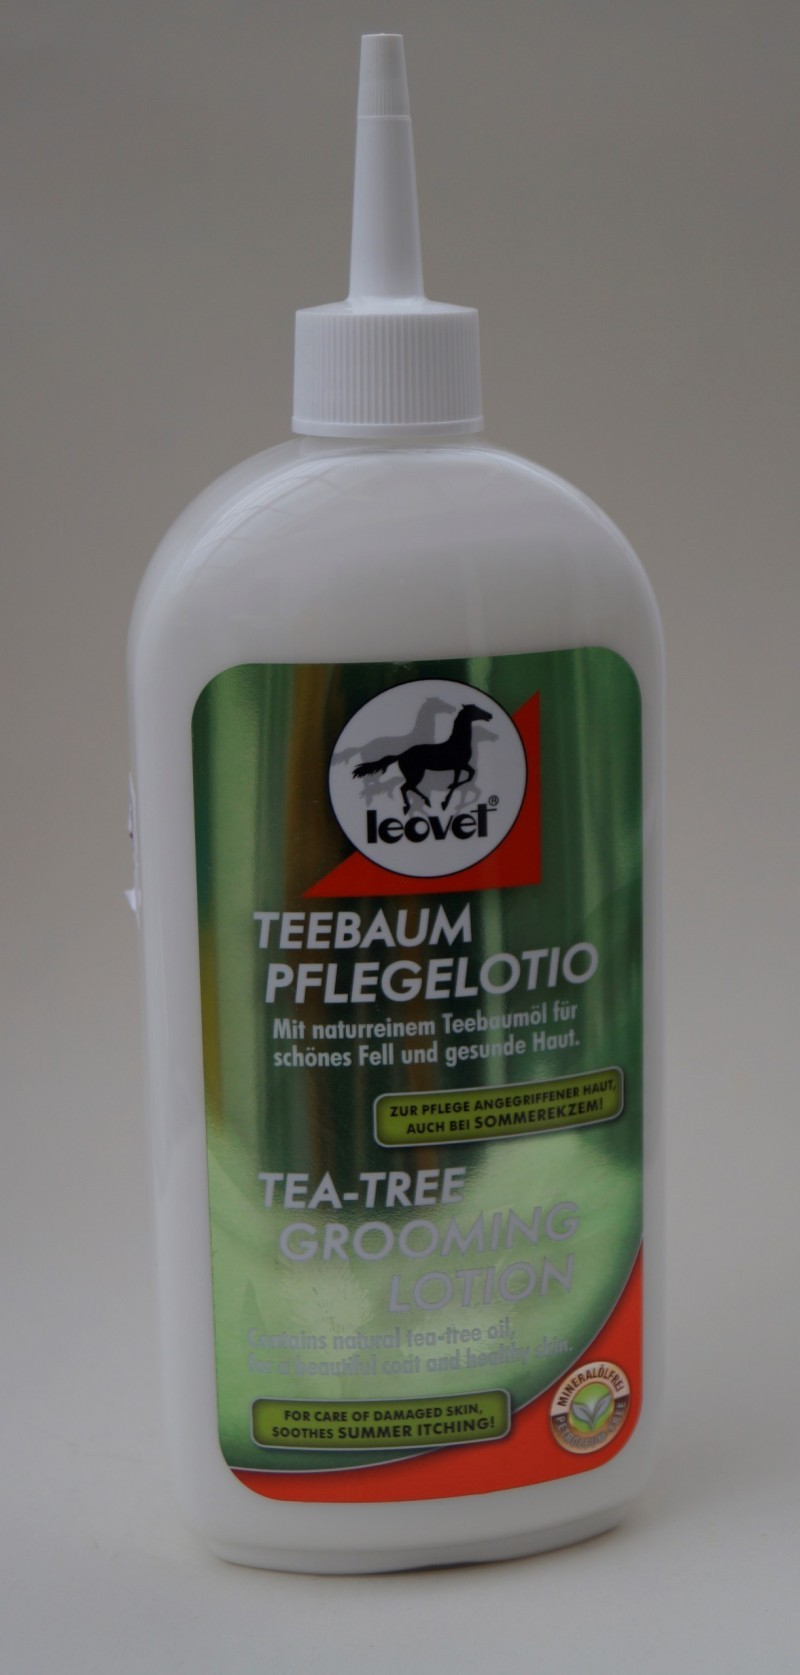 Leovet Teebaum Pflegelotion 1